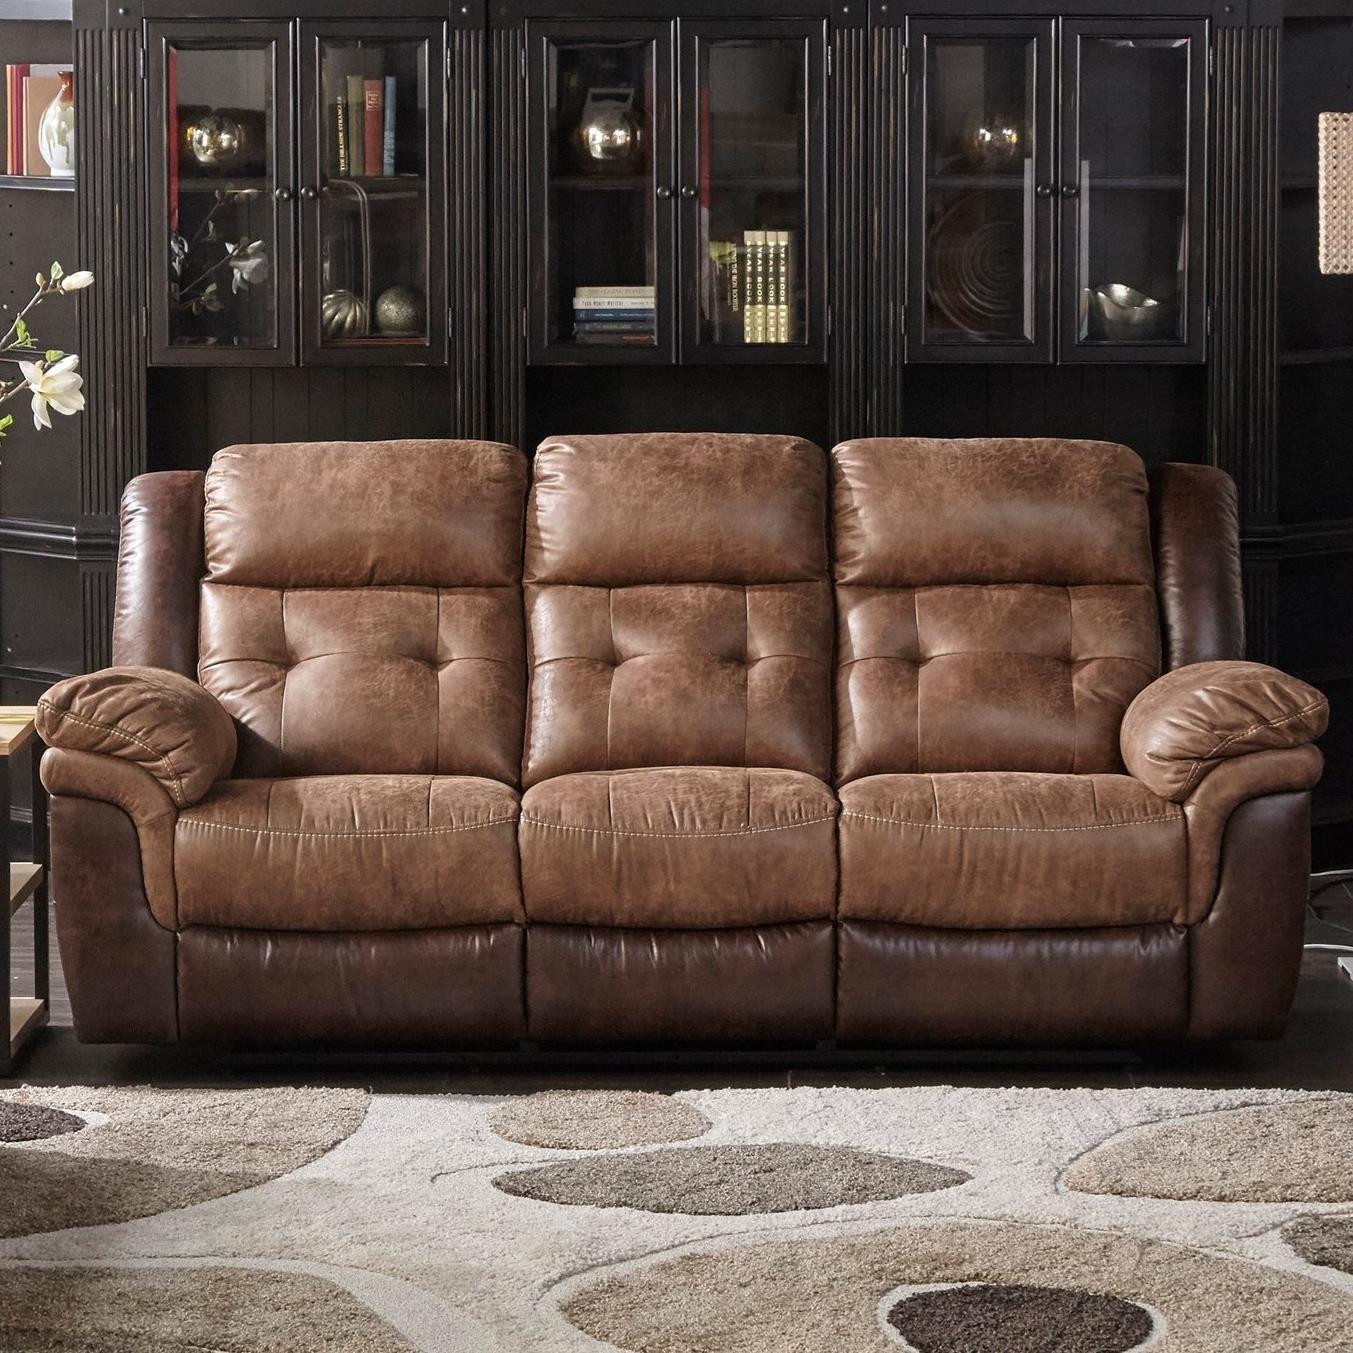 manwah sofa factory corner sofas uk argos alex express xw5156m l3 2m reclining